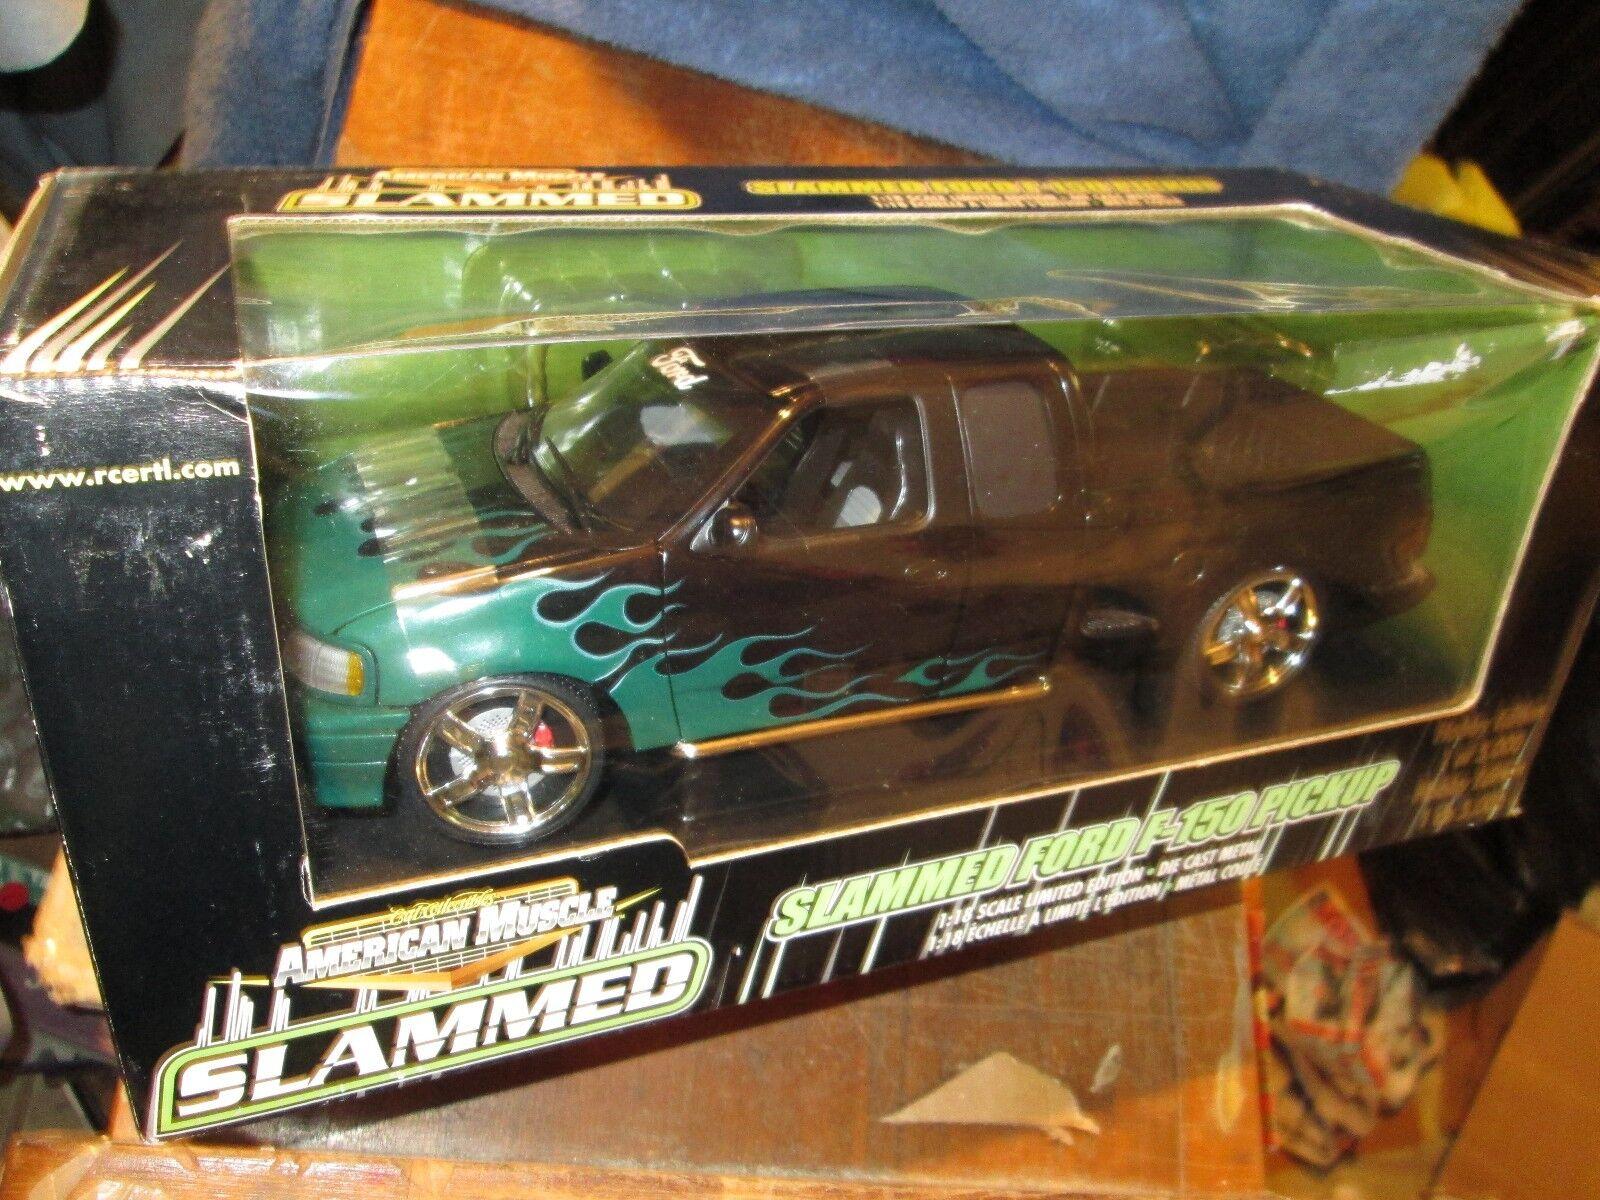 Golpe Ford F 150 Extendido Taxi nero Hobby Camioneta 1 18 Americano